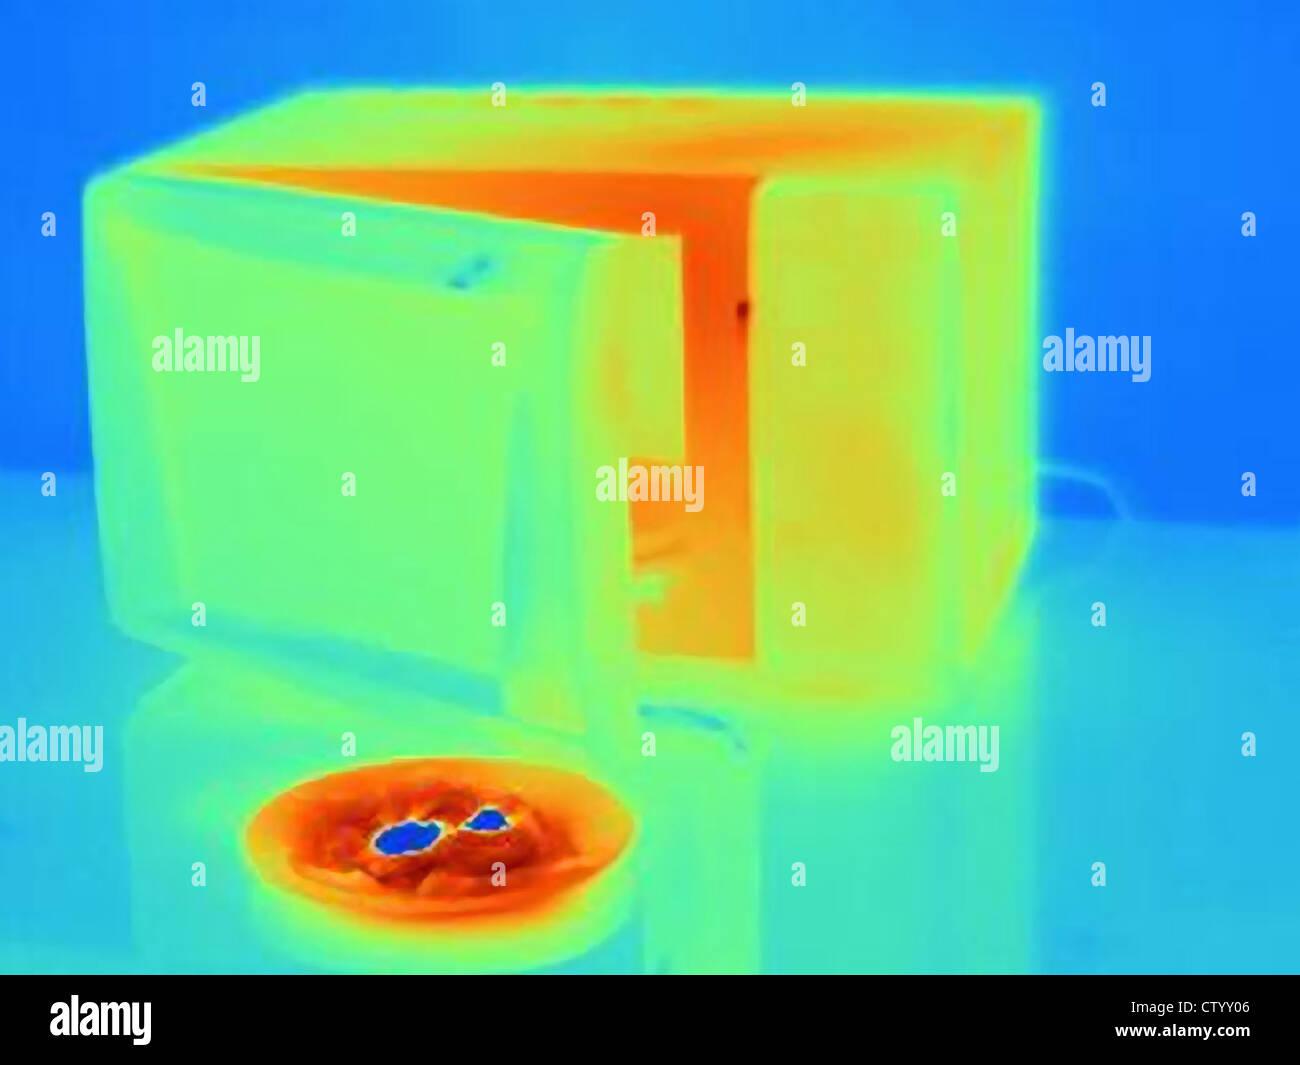 Wärmebild von Mikrowelle und Essen Stockbild